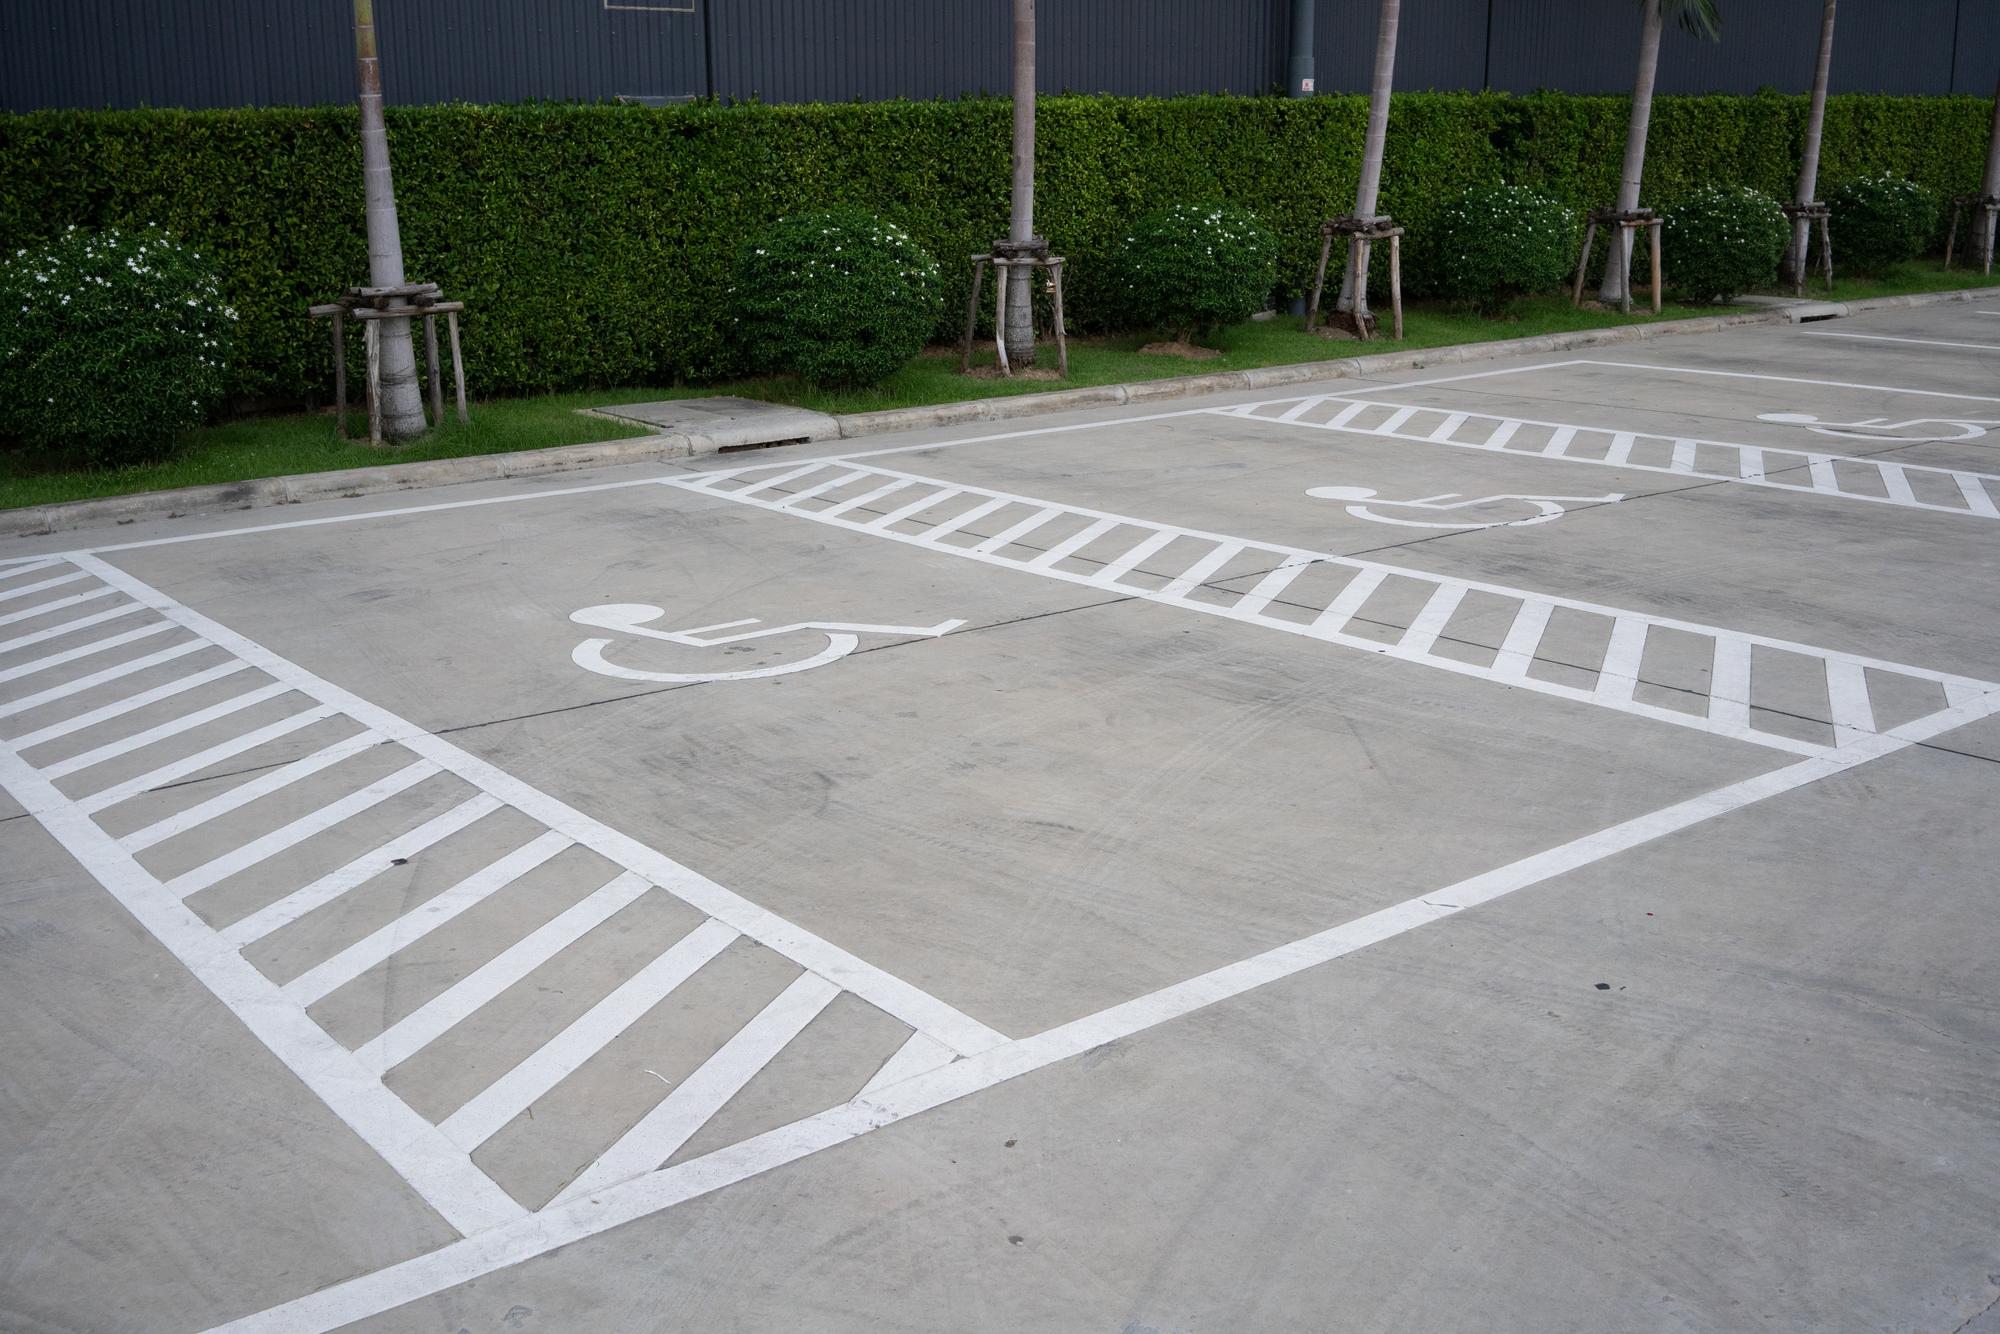 Parking Lot Striping for Tulsa